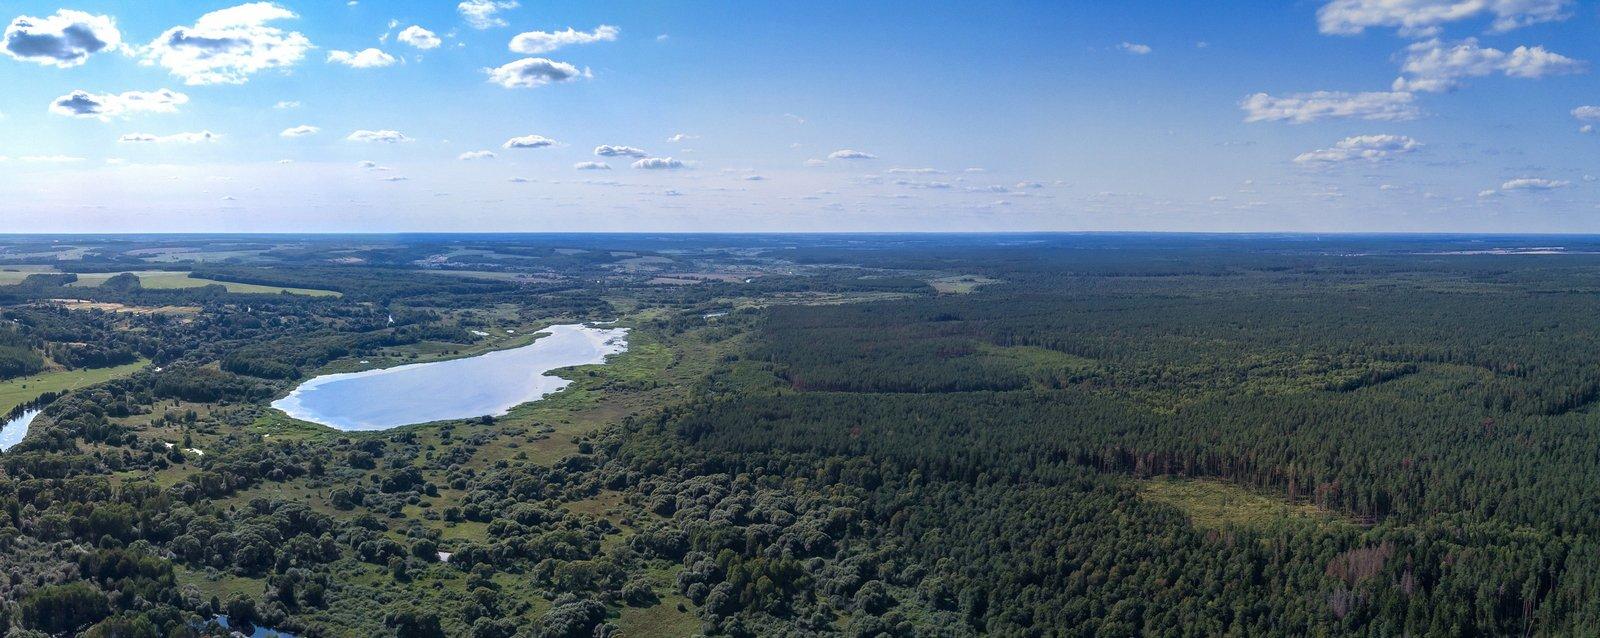 озеро Бечино